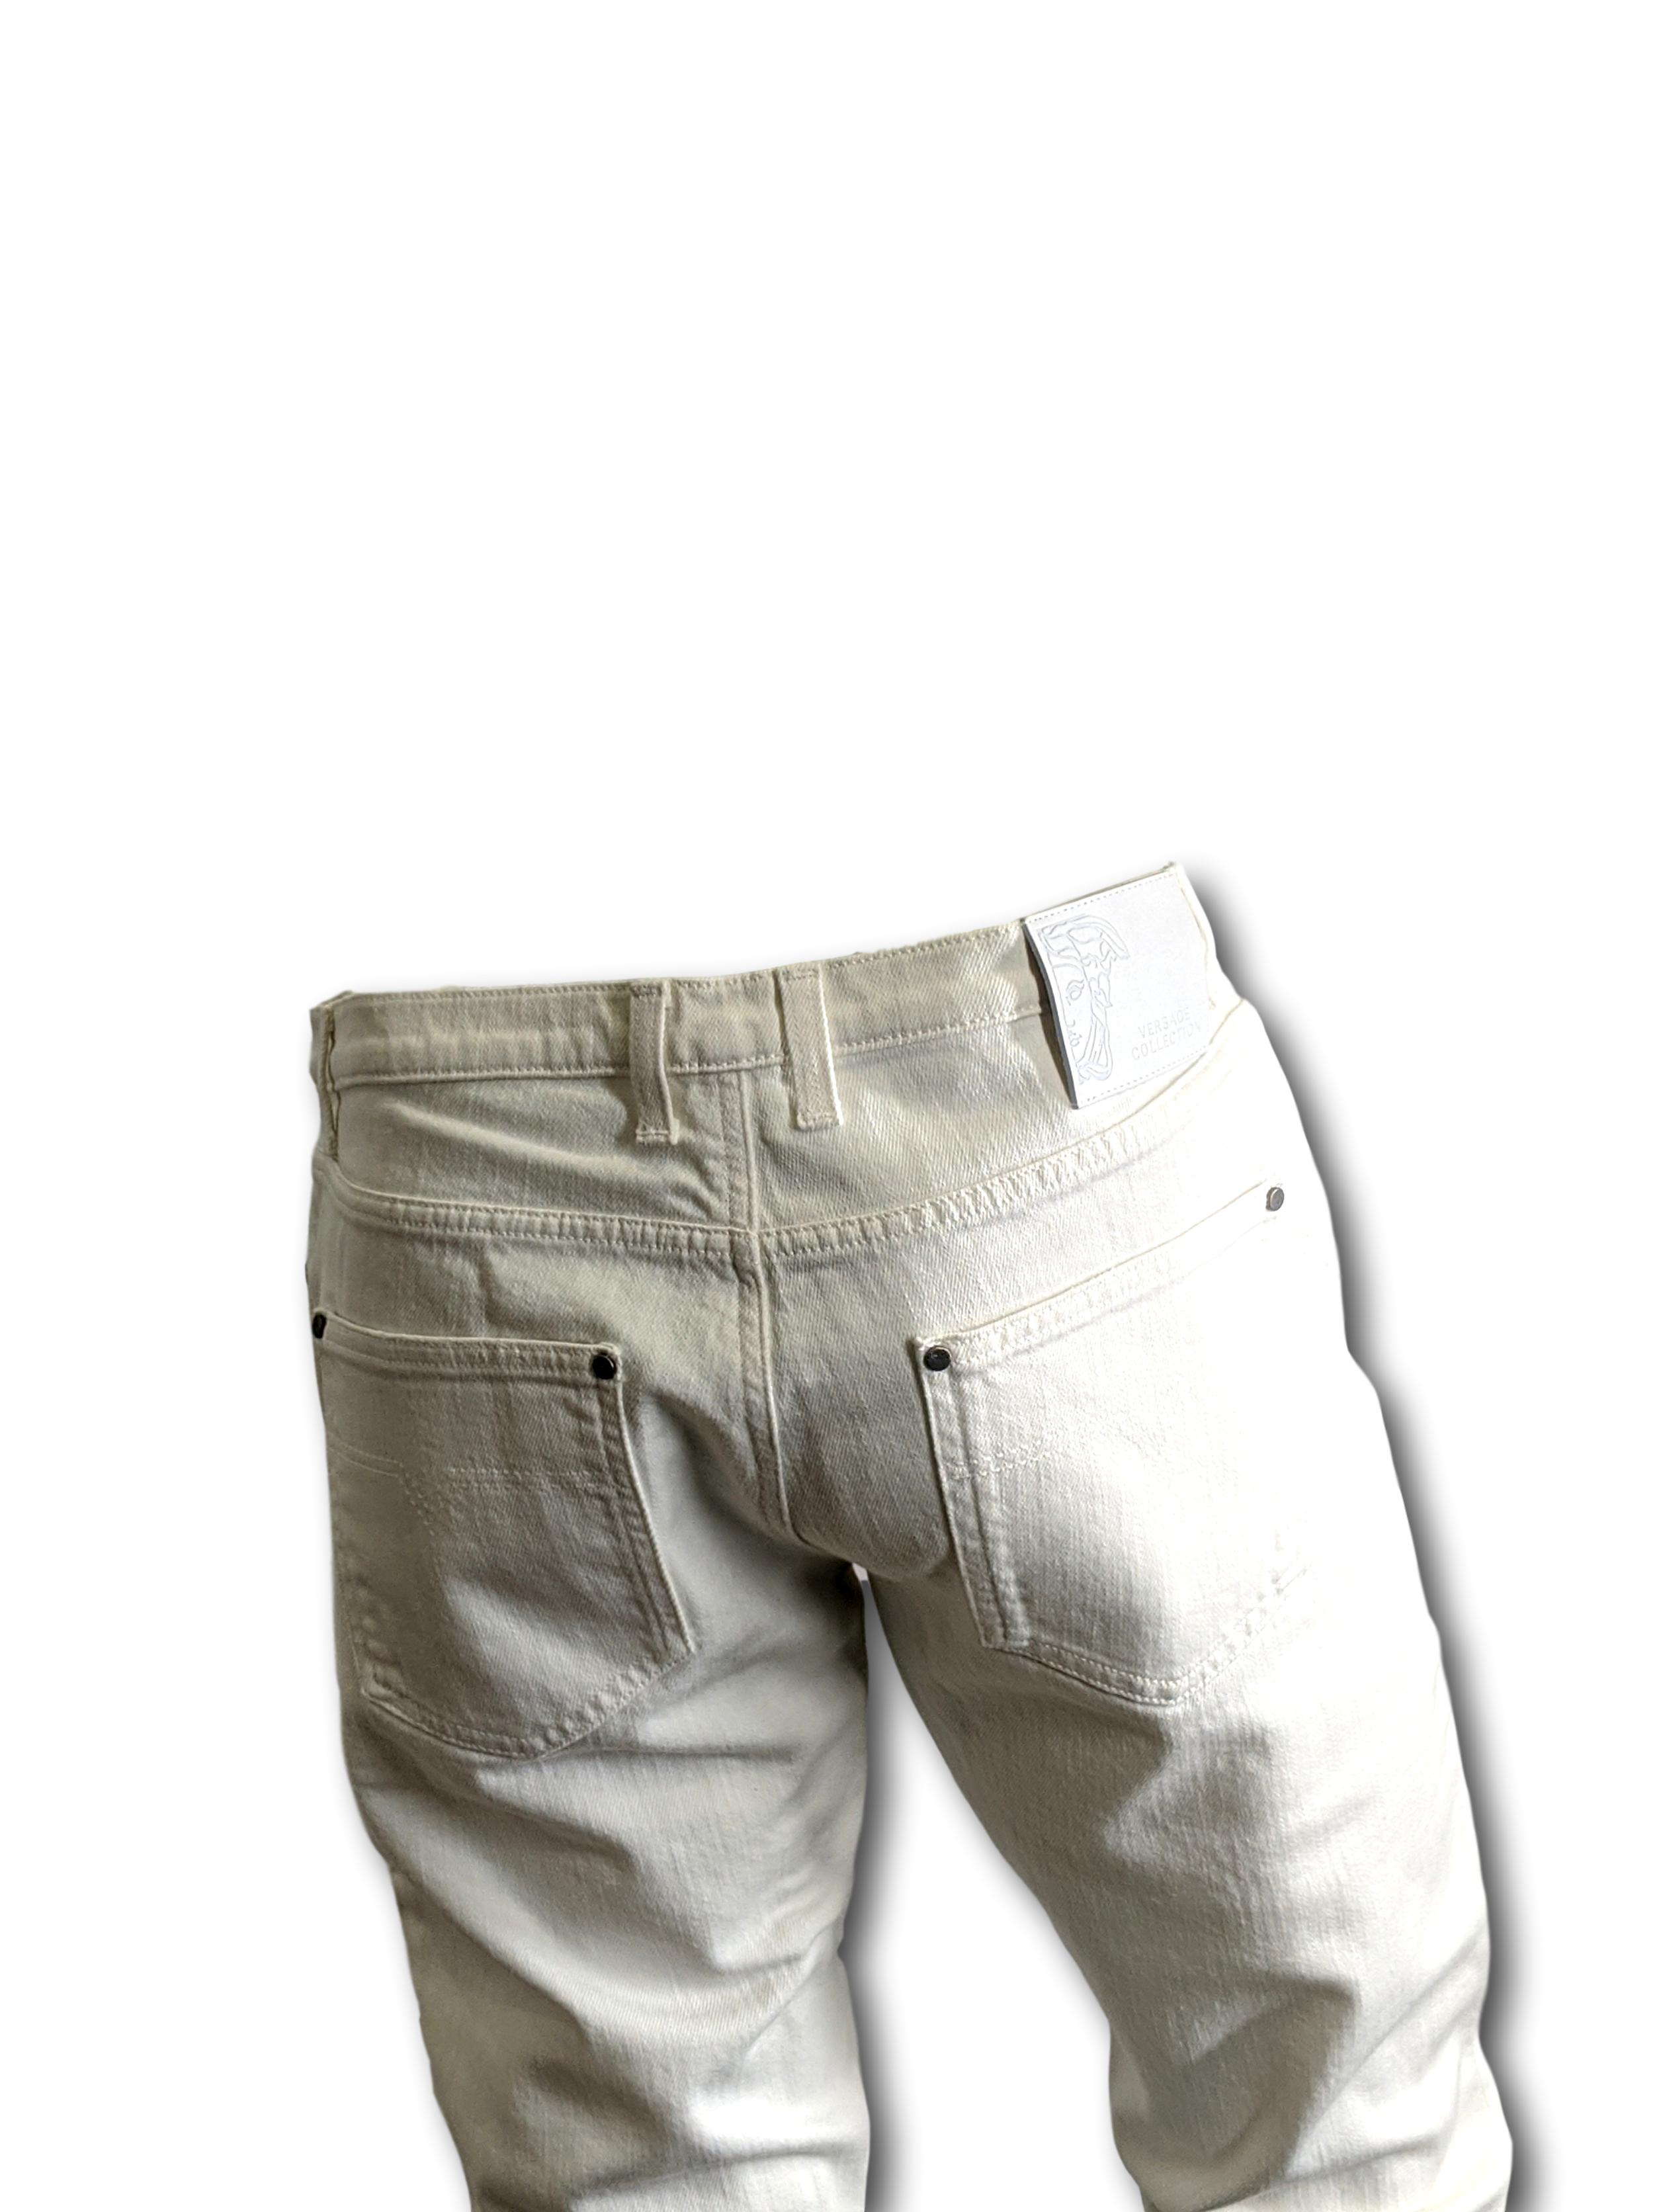 Pantalone Casual Versace VERSACE COLLECTION | Pantaloni | V2.V600250.9252V082